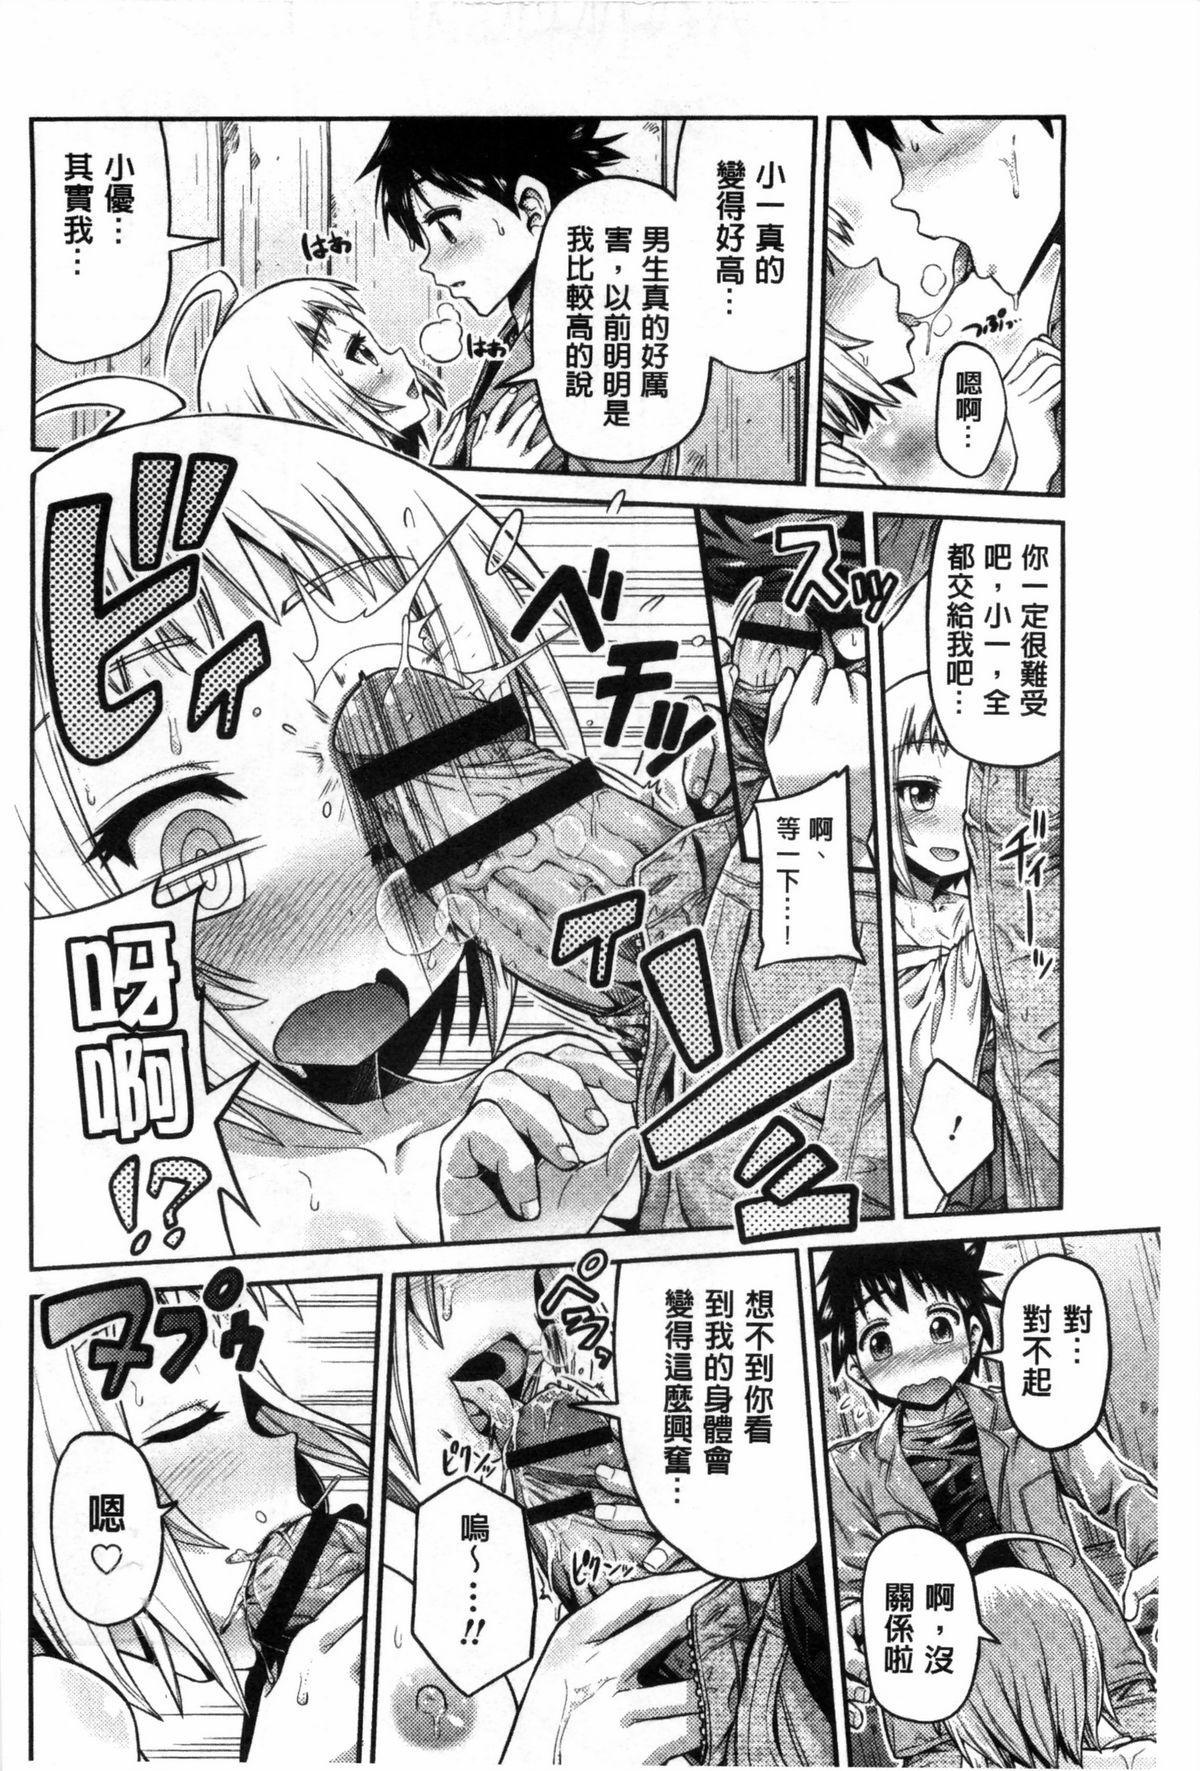 Man x Koi - Ero Manga de Hajimaru Koi no Plot   A漫×戀情 由情色漫畫所萌生的戀之物語 86